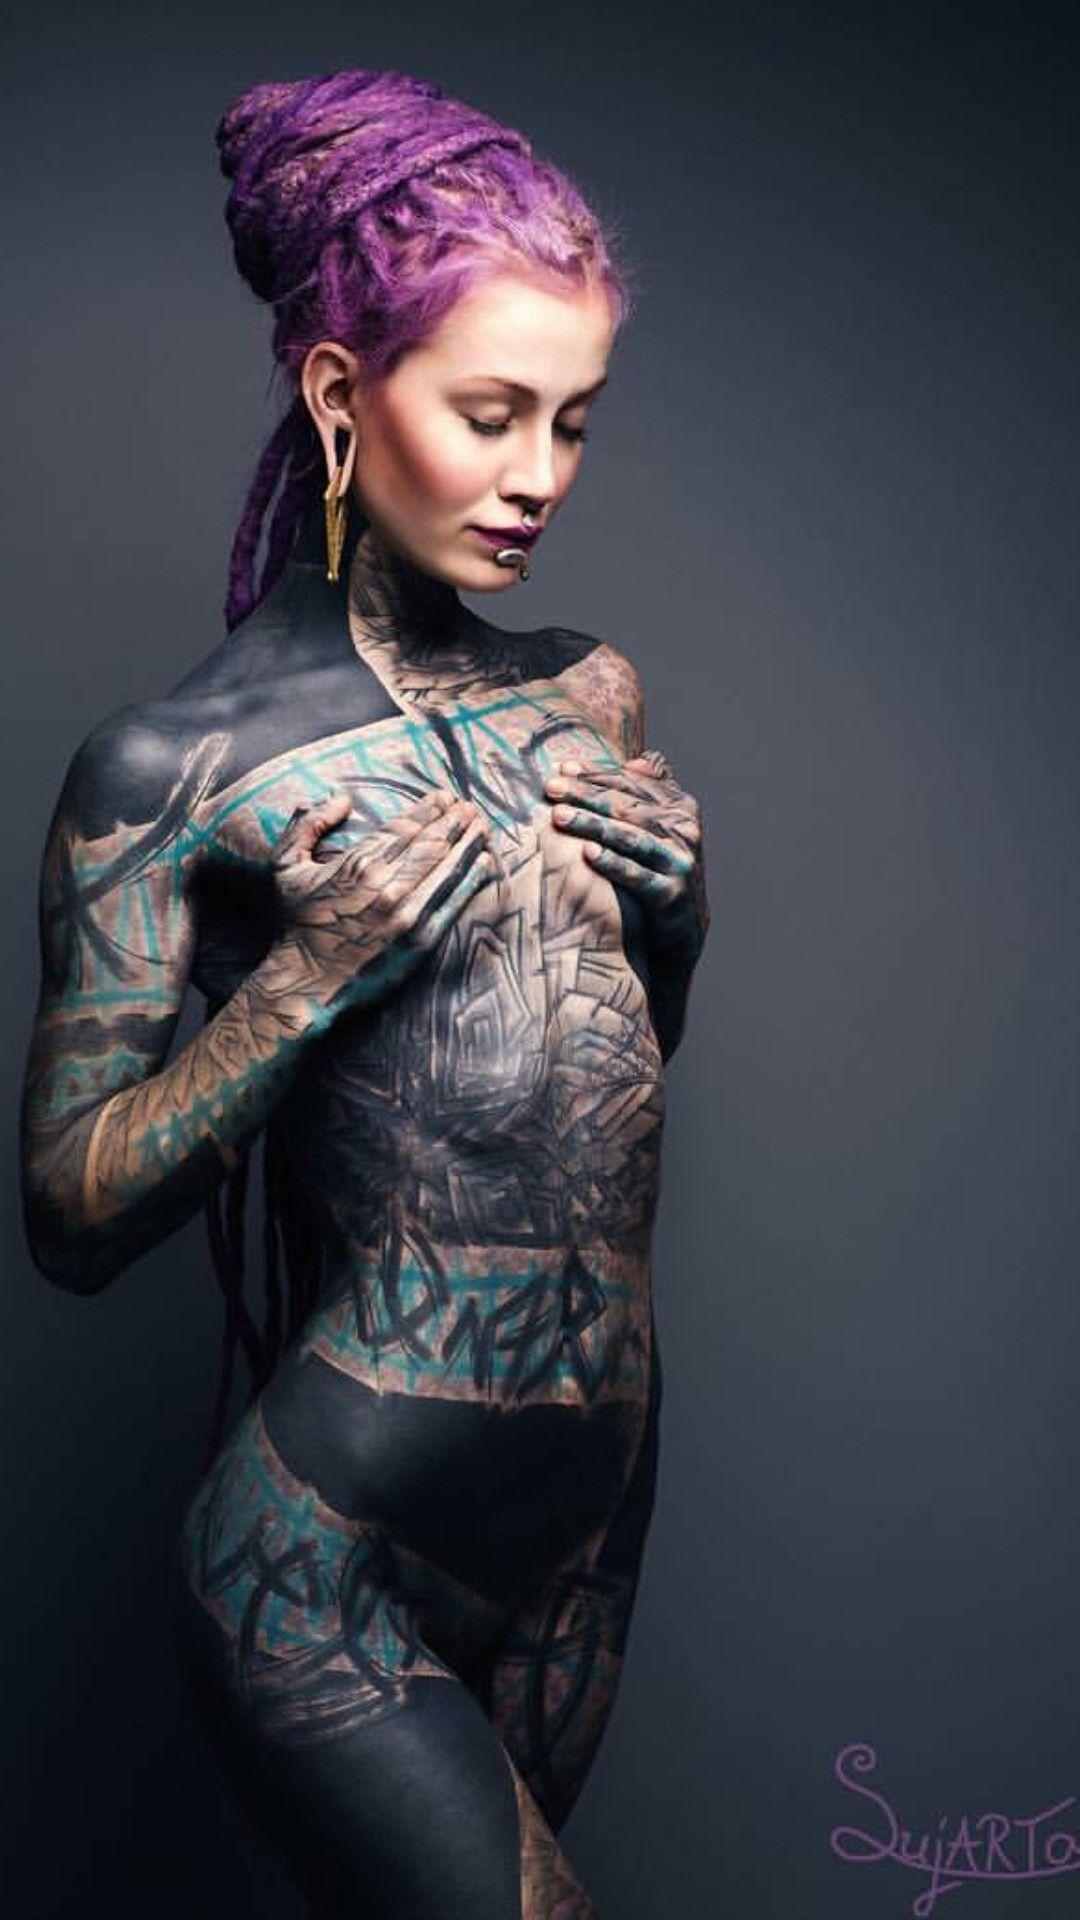 full body tattoos Tattoo photography, Girl tattoos